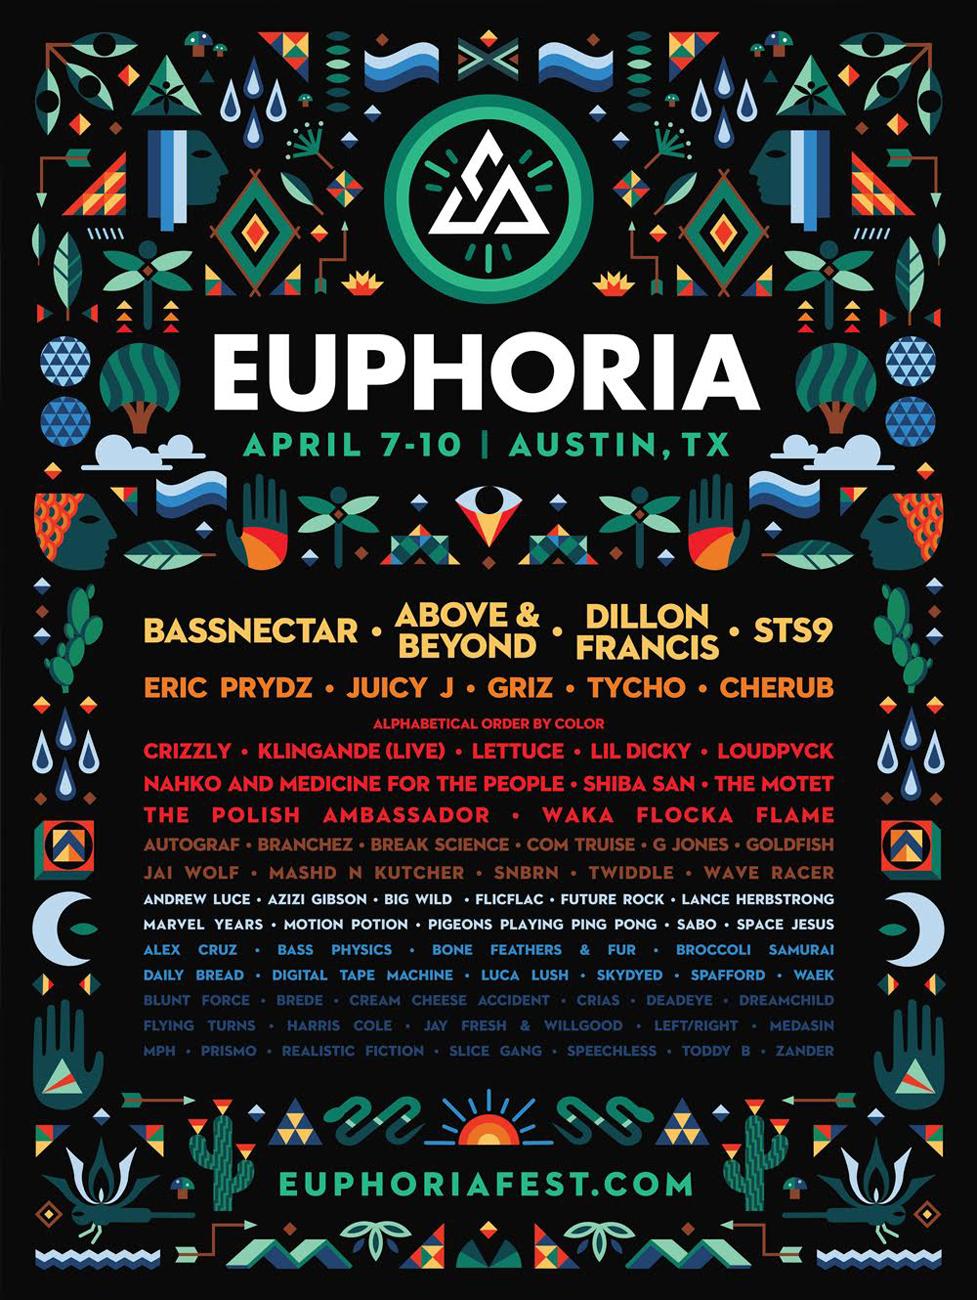 Euphoria Music Festival lineup. Photo provided.